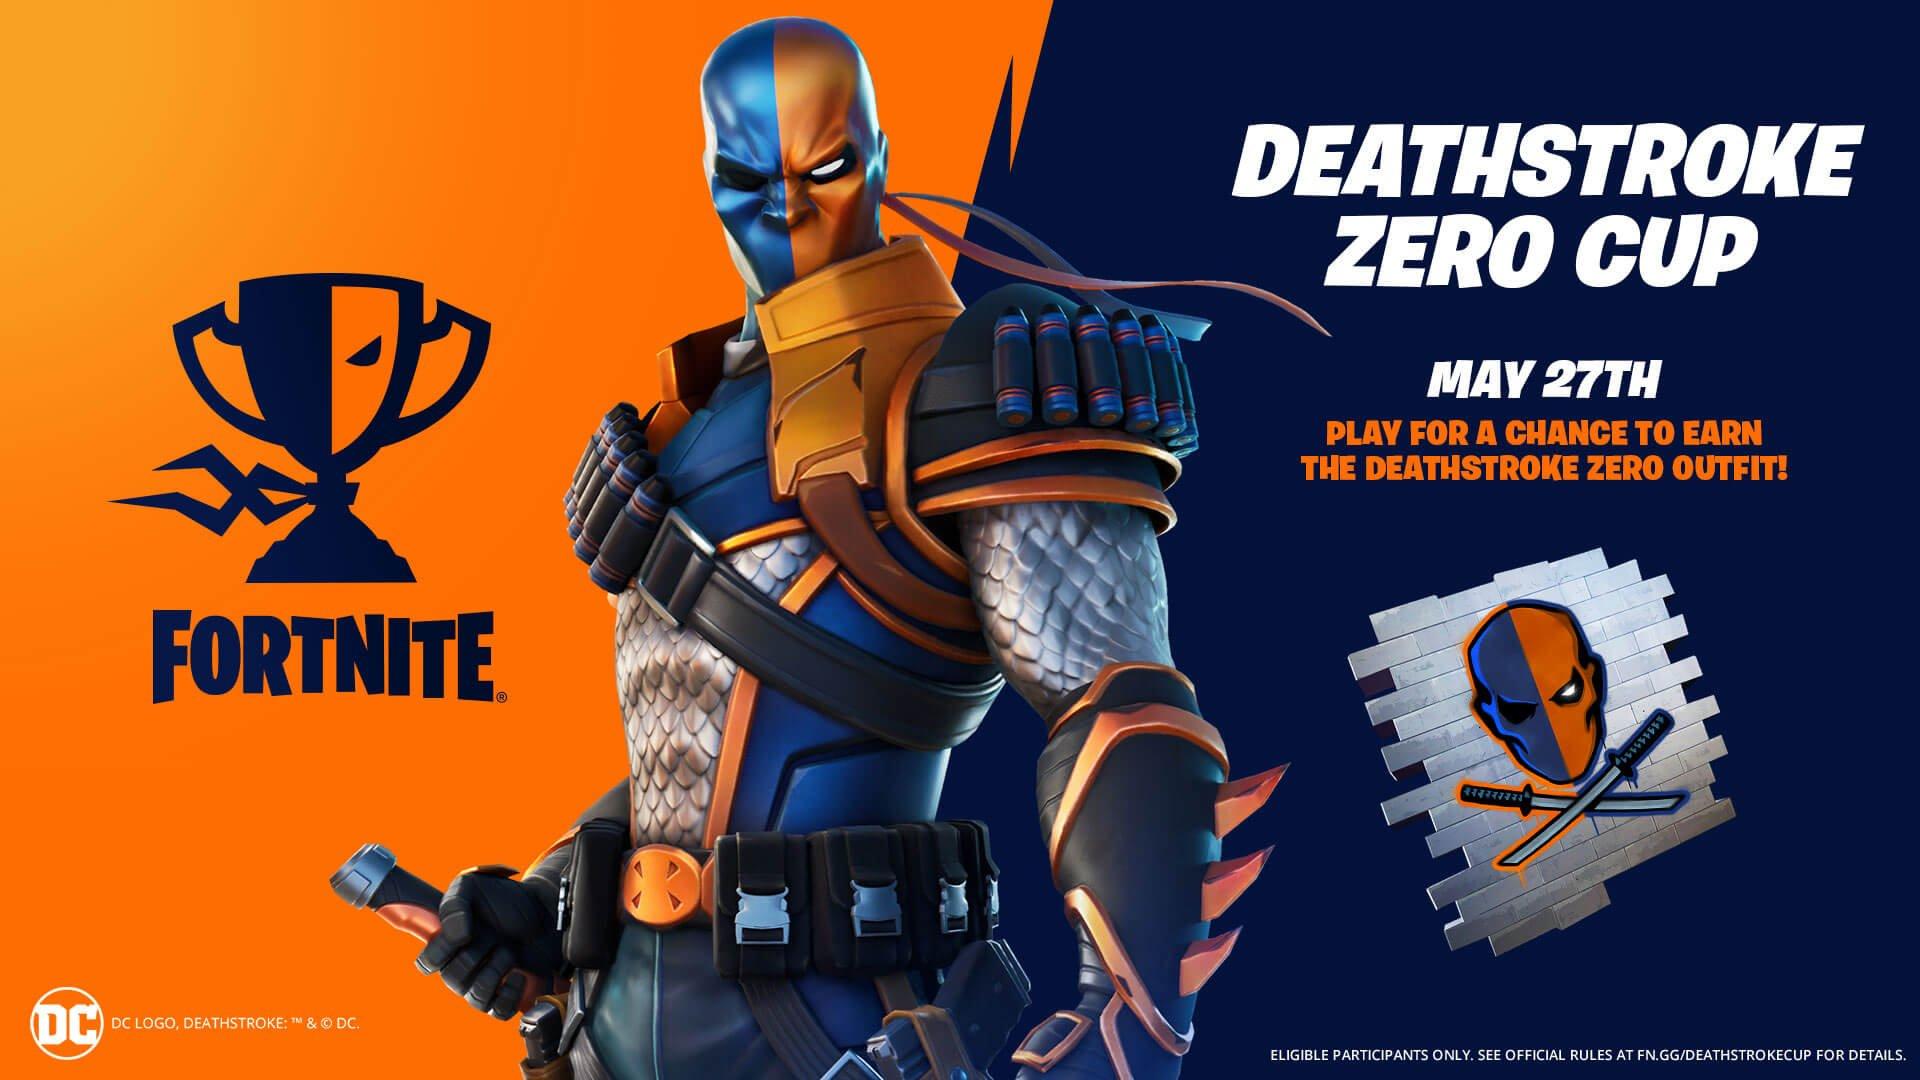 Deathstroke Fortnite skin